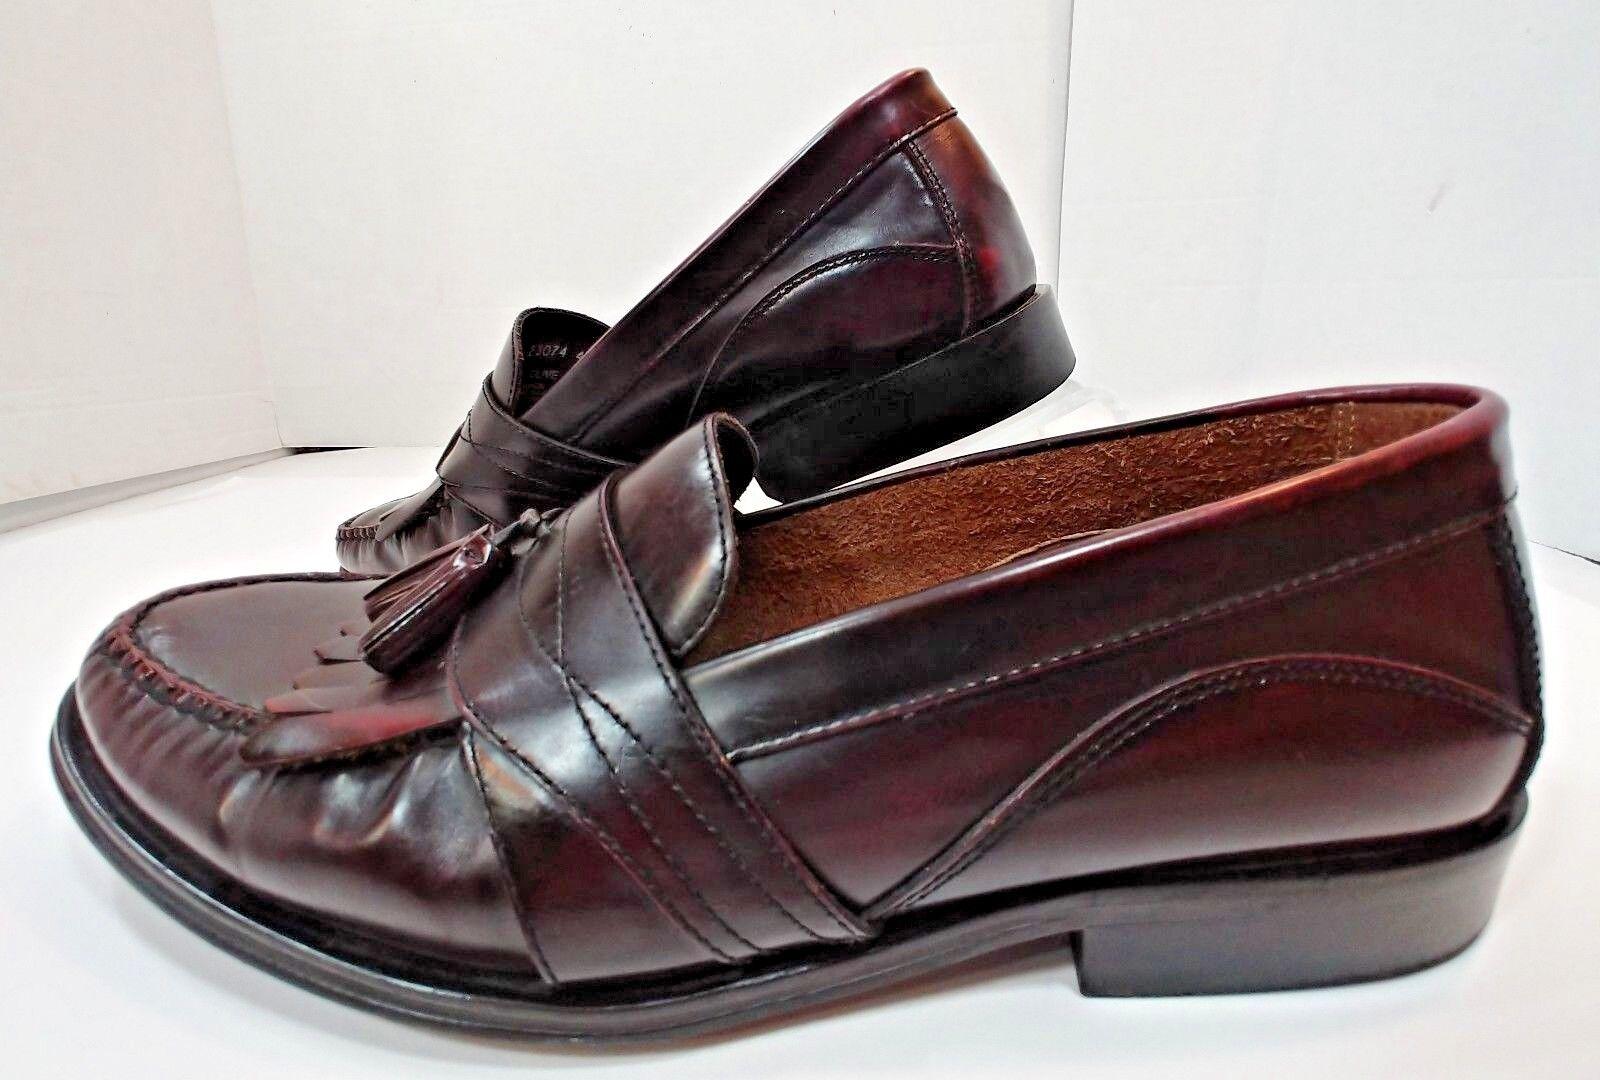 Bass Weejun Leather Kilt Loafer Wine Burgundy Cordovan Slip On shoes Mens 11.5D